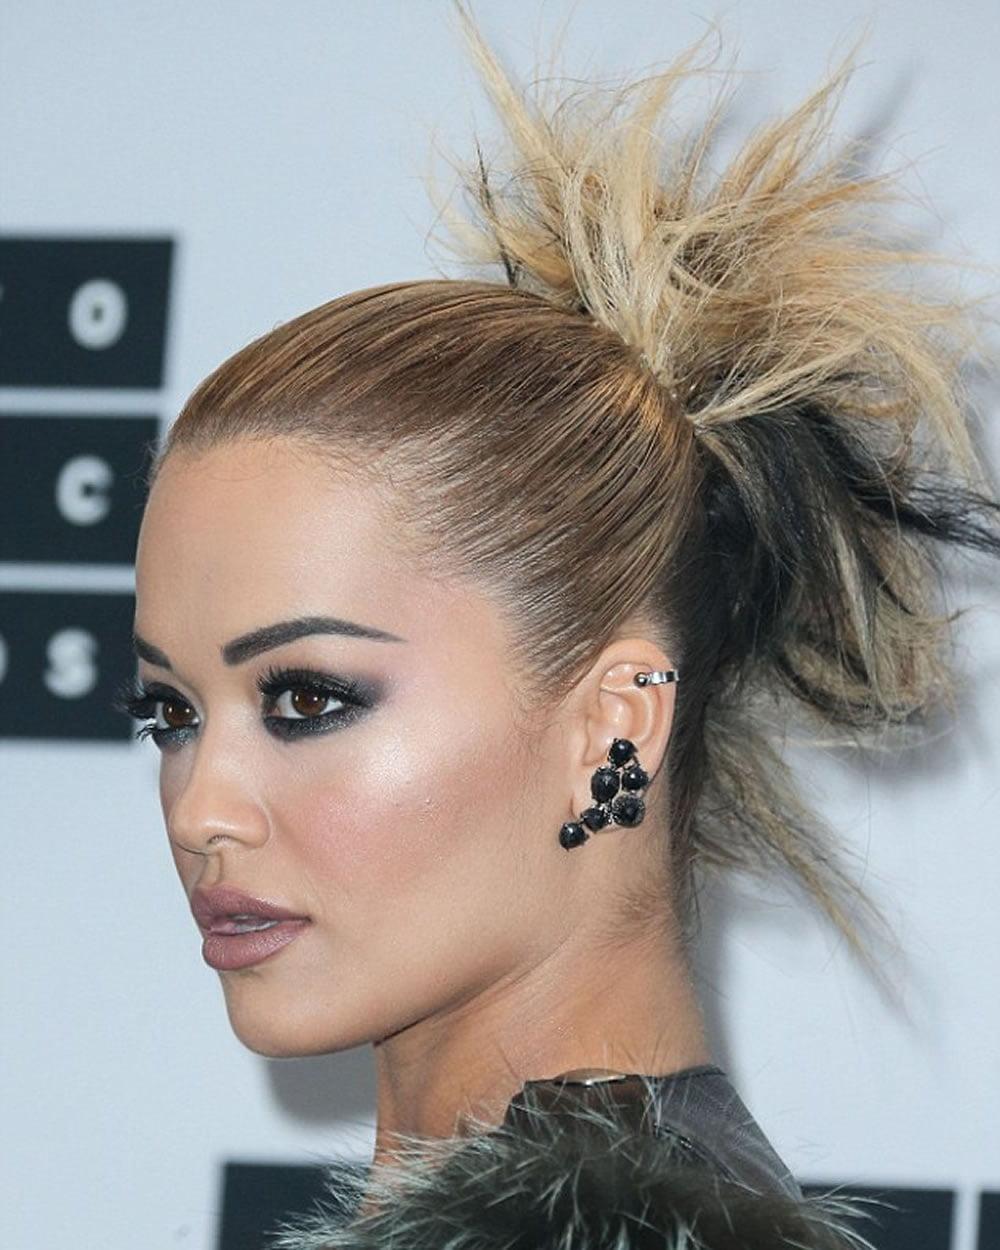 Rita Ora's Short (Pixie + Bob) Hairstyles for 2018